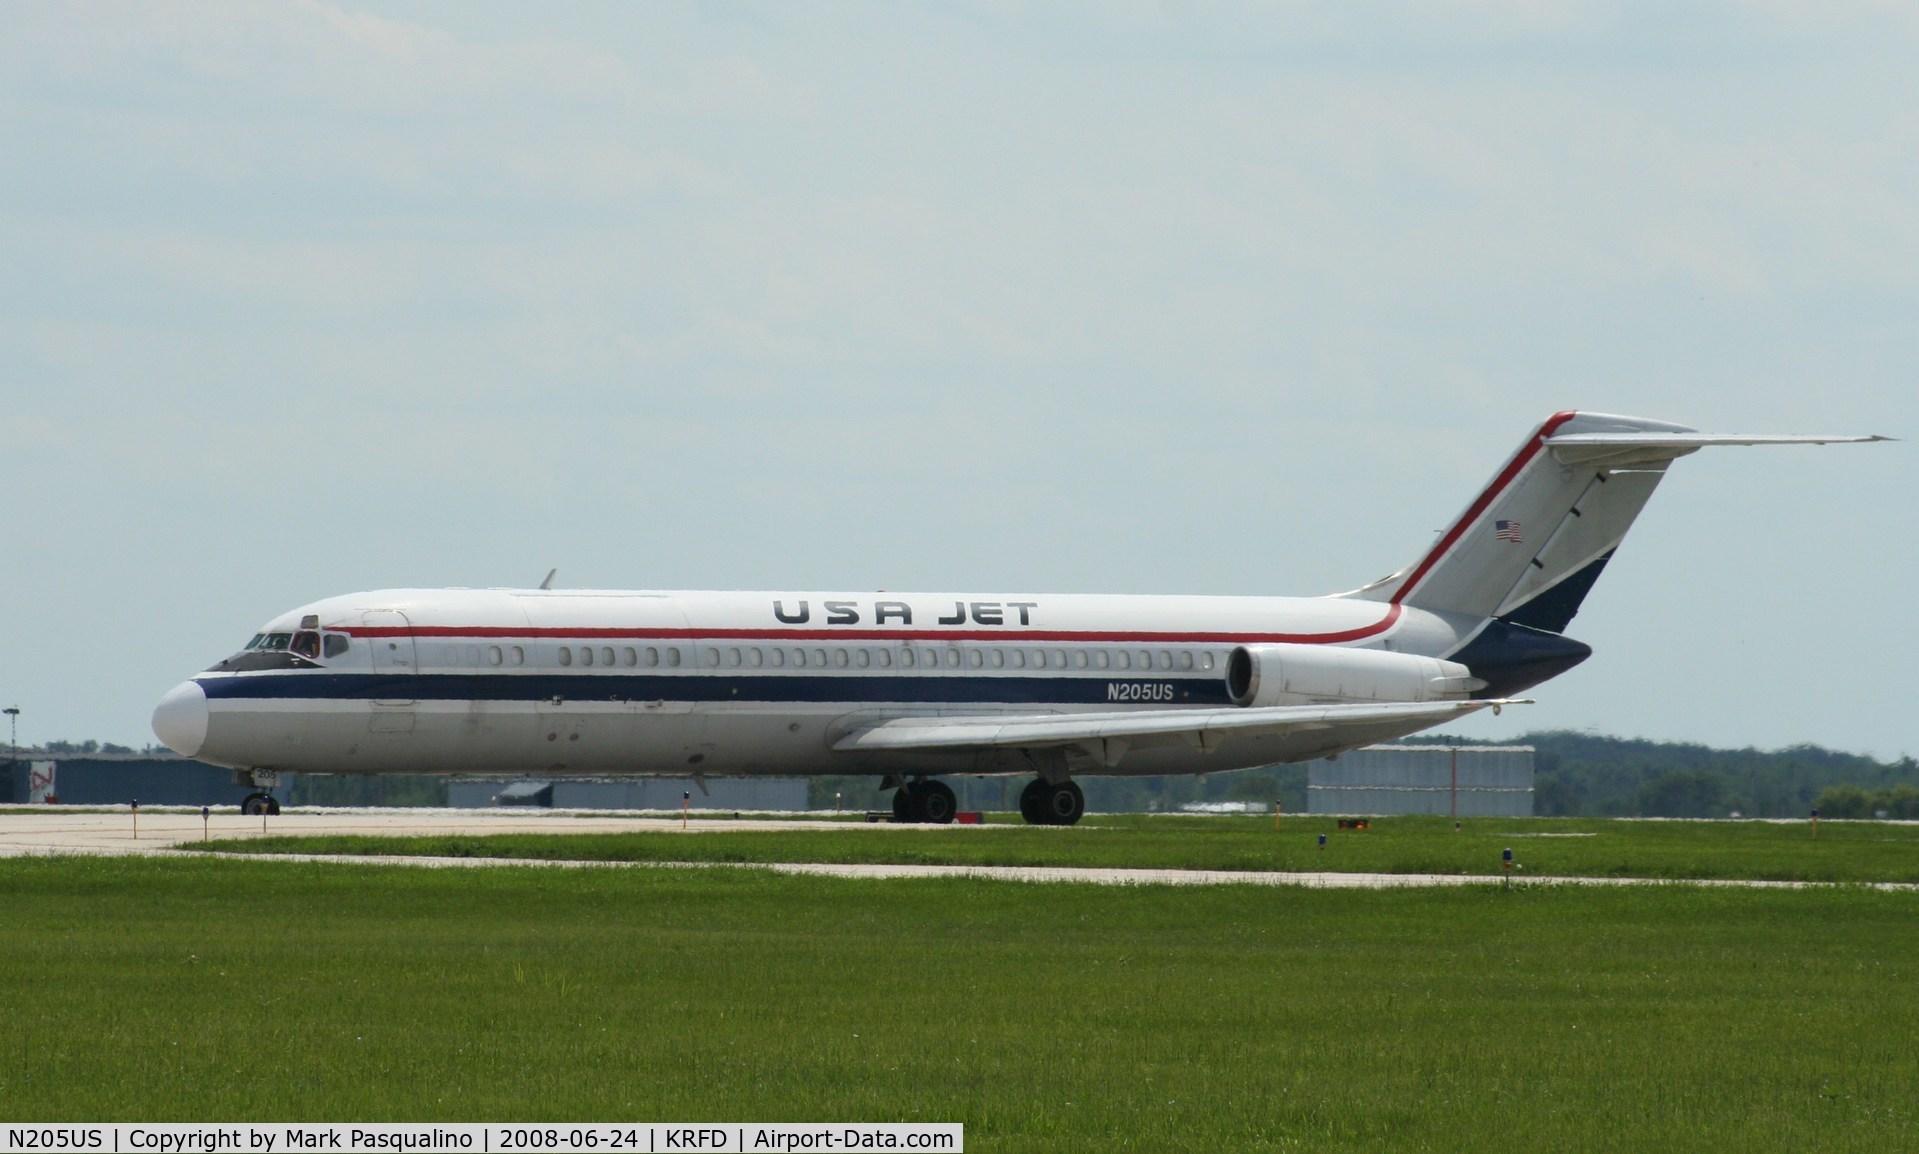 N205US, 1976 McDonnell Douglas DC-9-32F C/N 47690, DC-9-32F